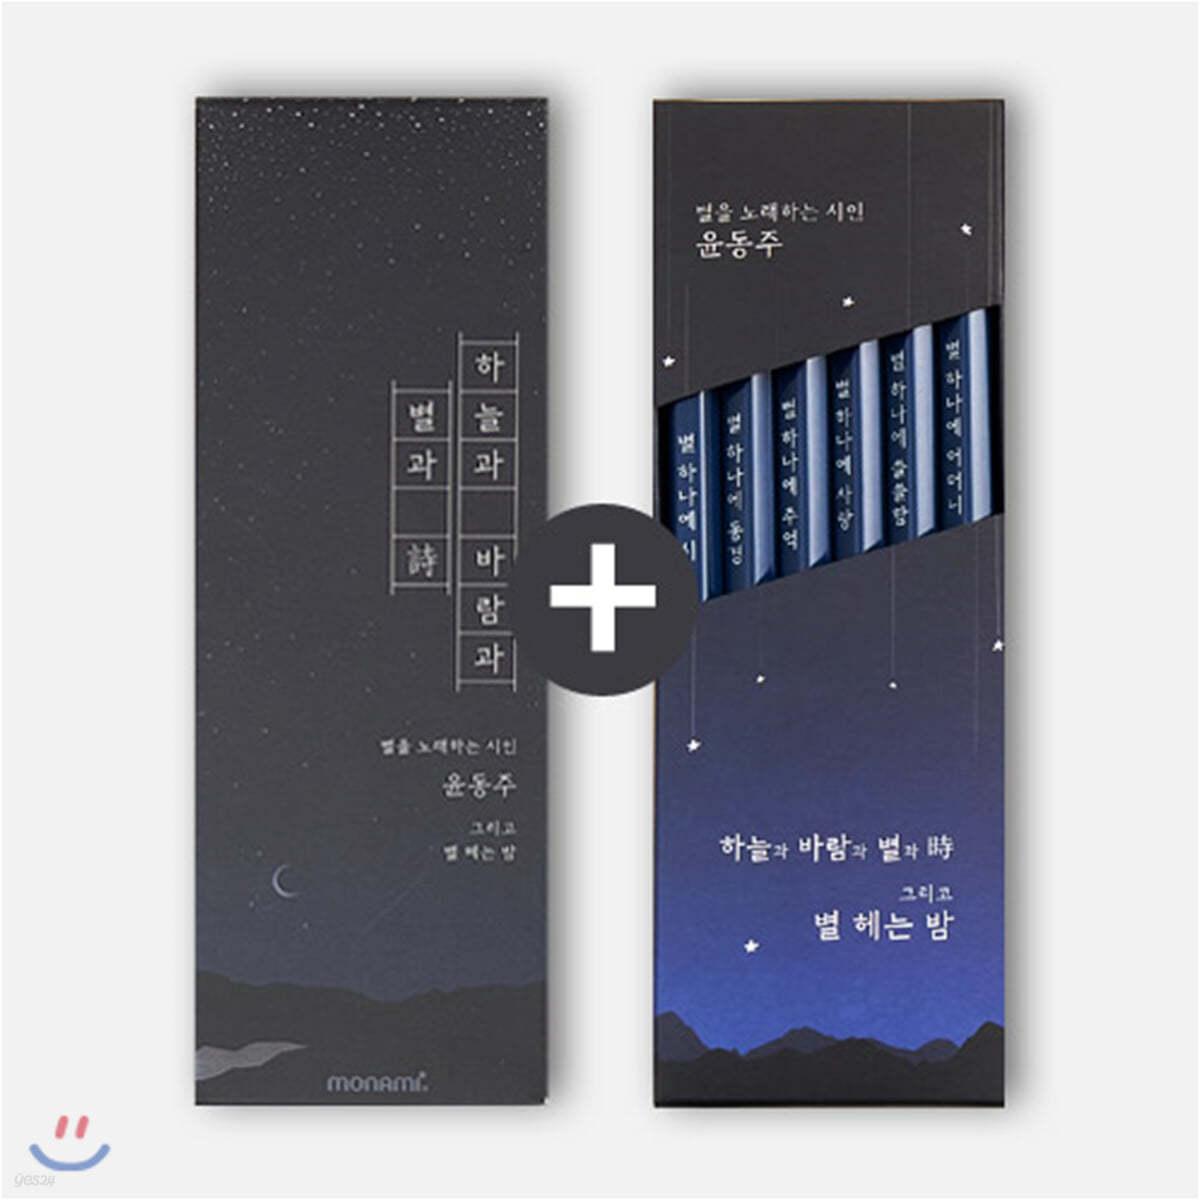 [YES24단독판매] 윤동주 별 헤는 밤 매트블랙 ver. 모나미 6P세트 + 윤동주 별 헤는 밤 클래식블루 ver. 모나미 6P세트